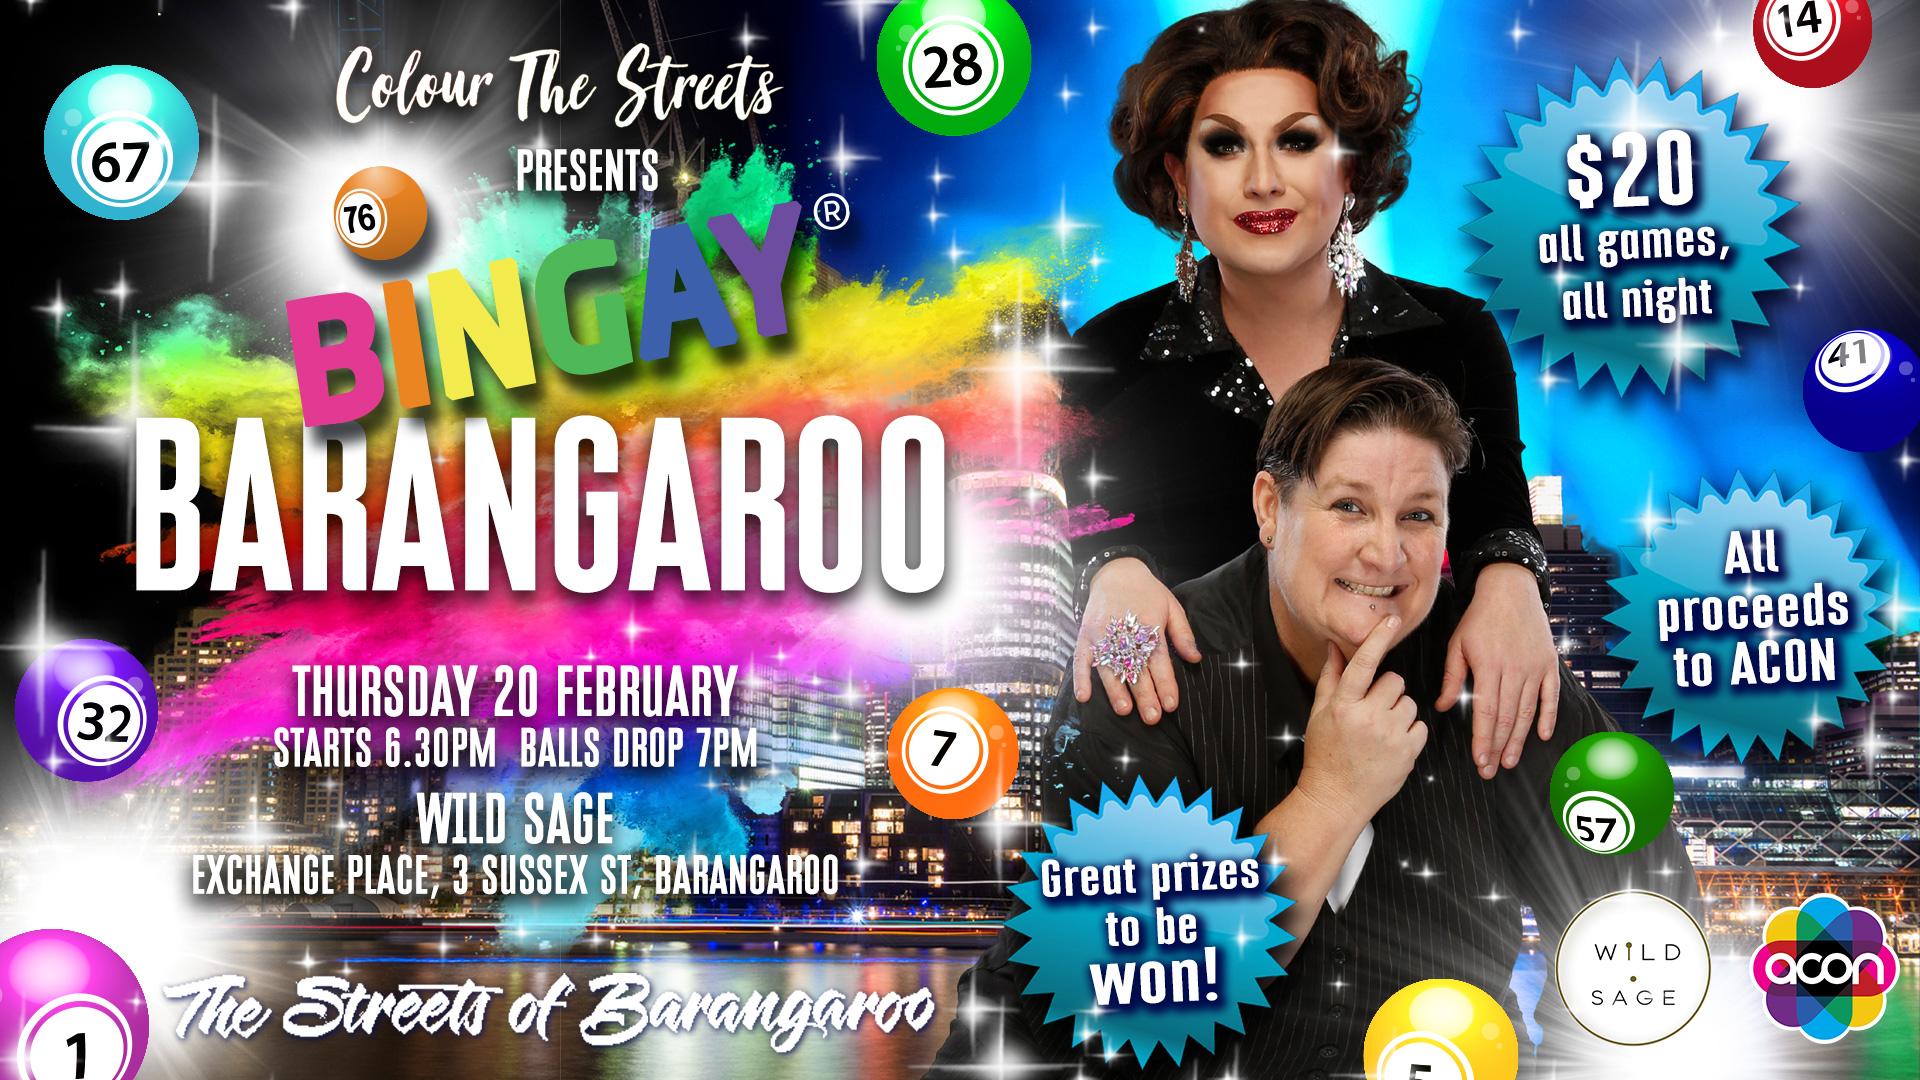 Bingay_at_Barangaroo_-_FB_Event.jpg